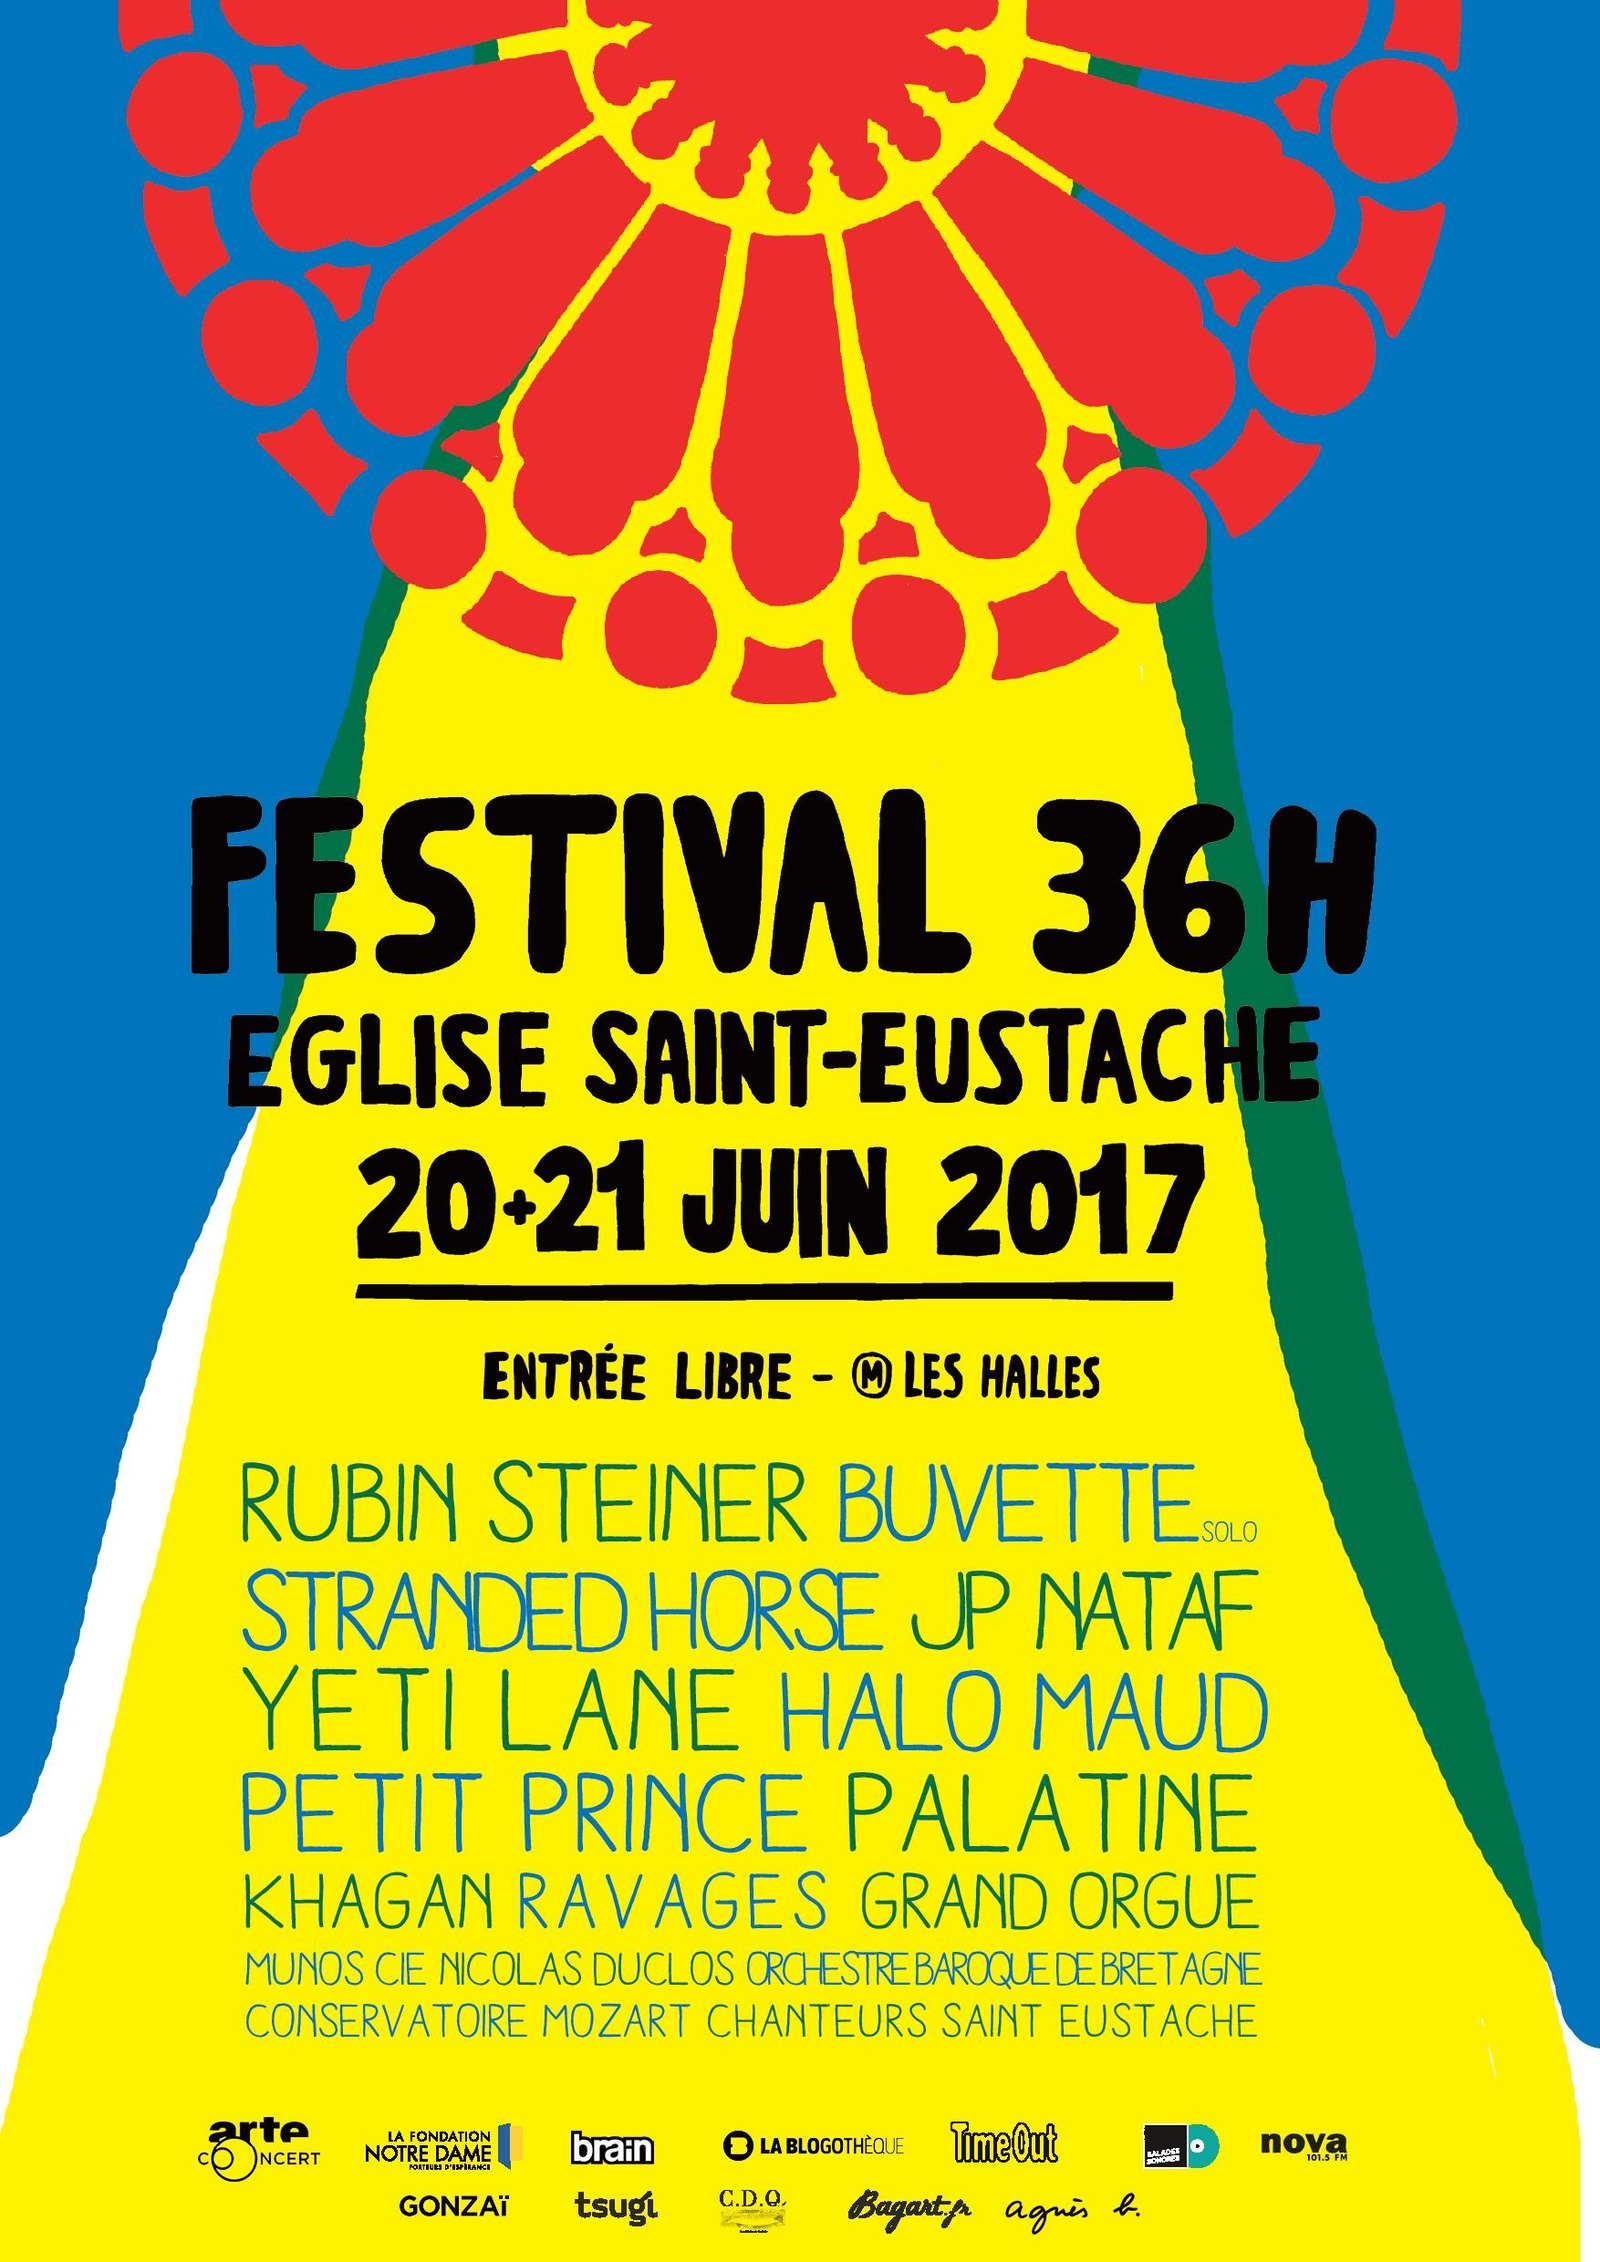 6d0fff62b evfevent_festival-36h_368680.jpg